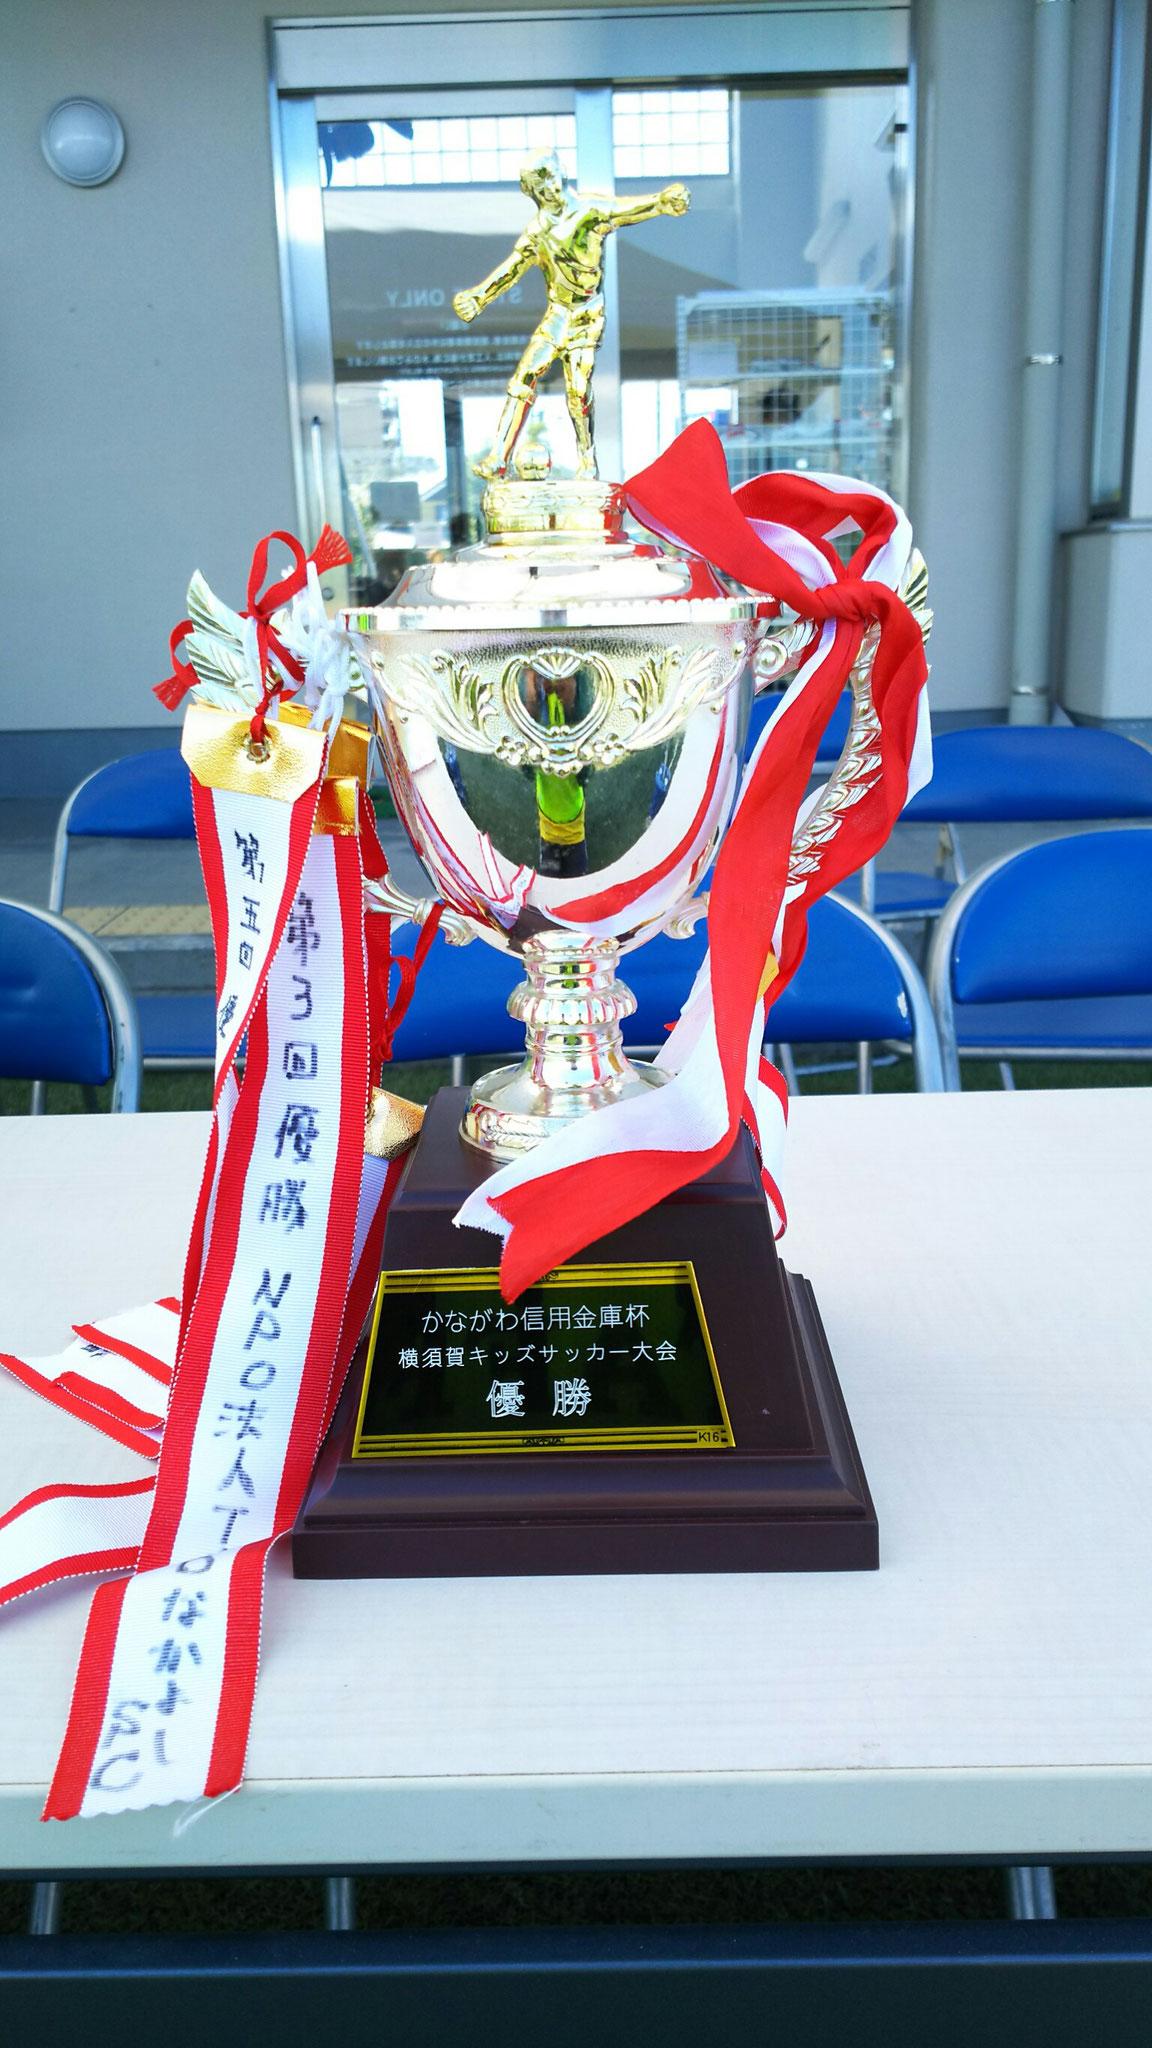 10/15 U-6以下 かながわ信用金庫杯 キッズ大会